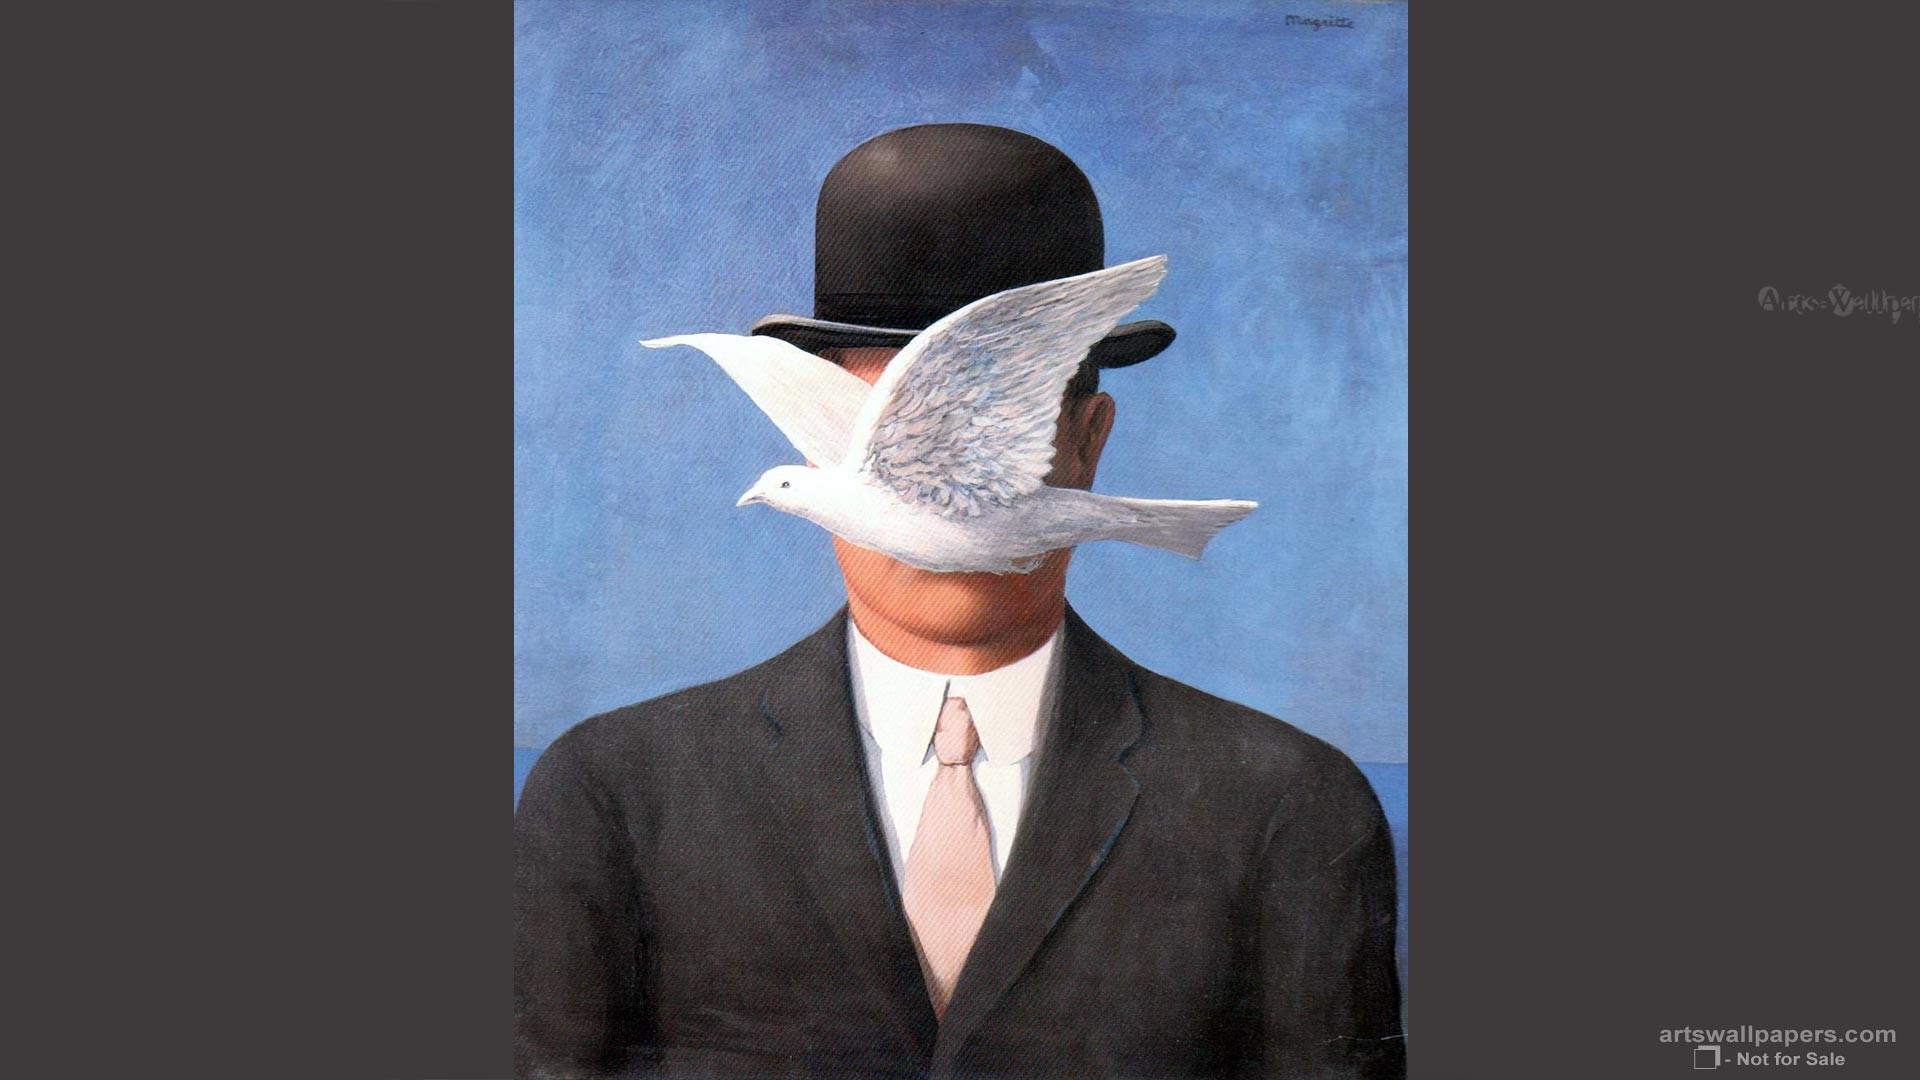 Res: 1920x1080, Rene Magritte Wallpapers Rene Magritte Art Paitning